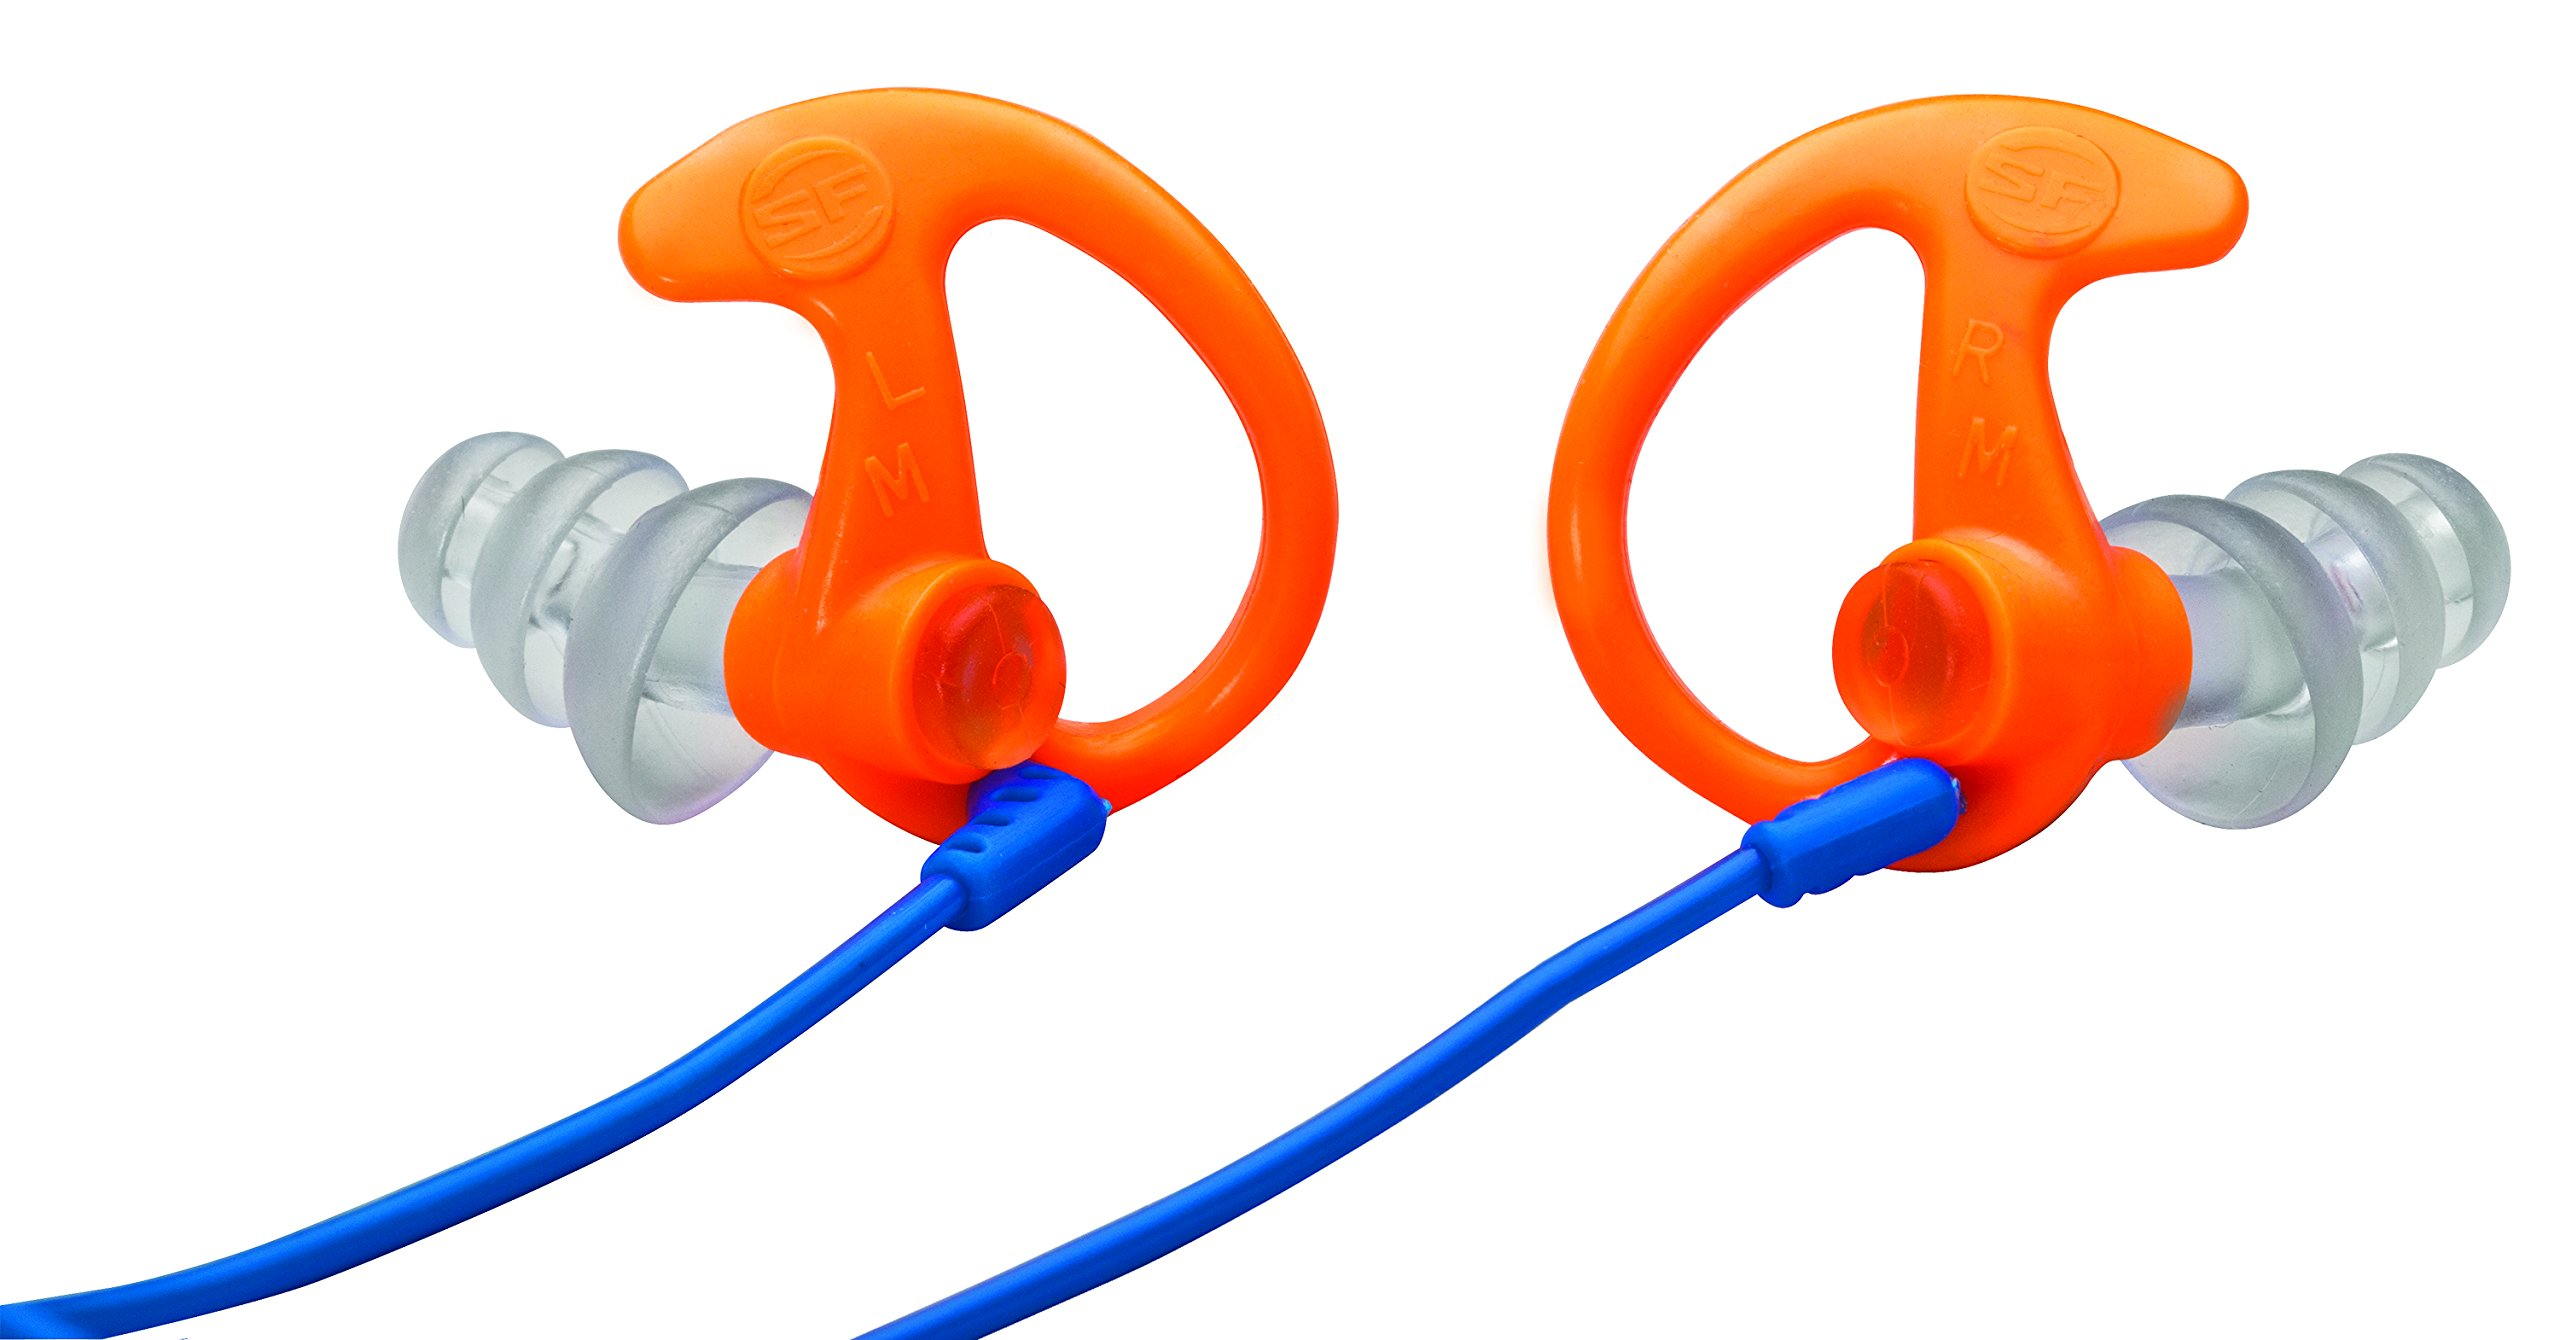 SureFire EP5 Sonic Defenders Max Full-Block Earplugs, triple flanged design, reusable